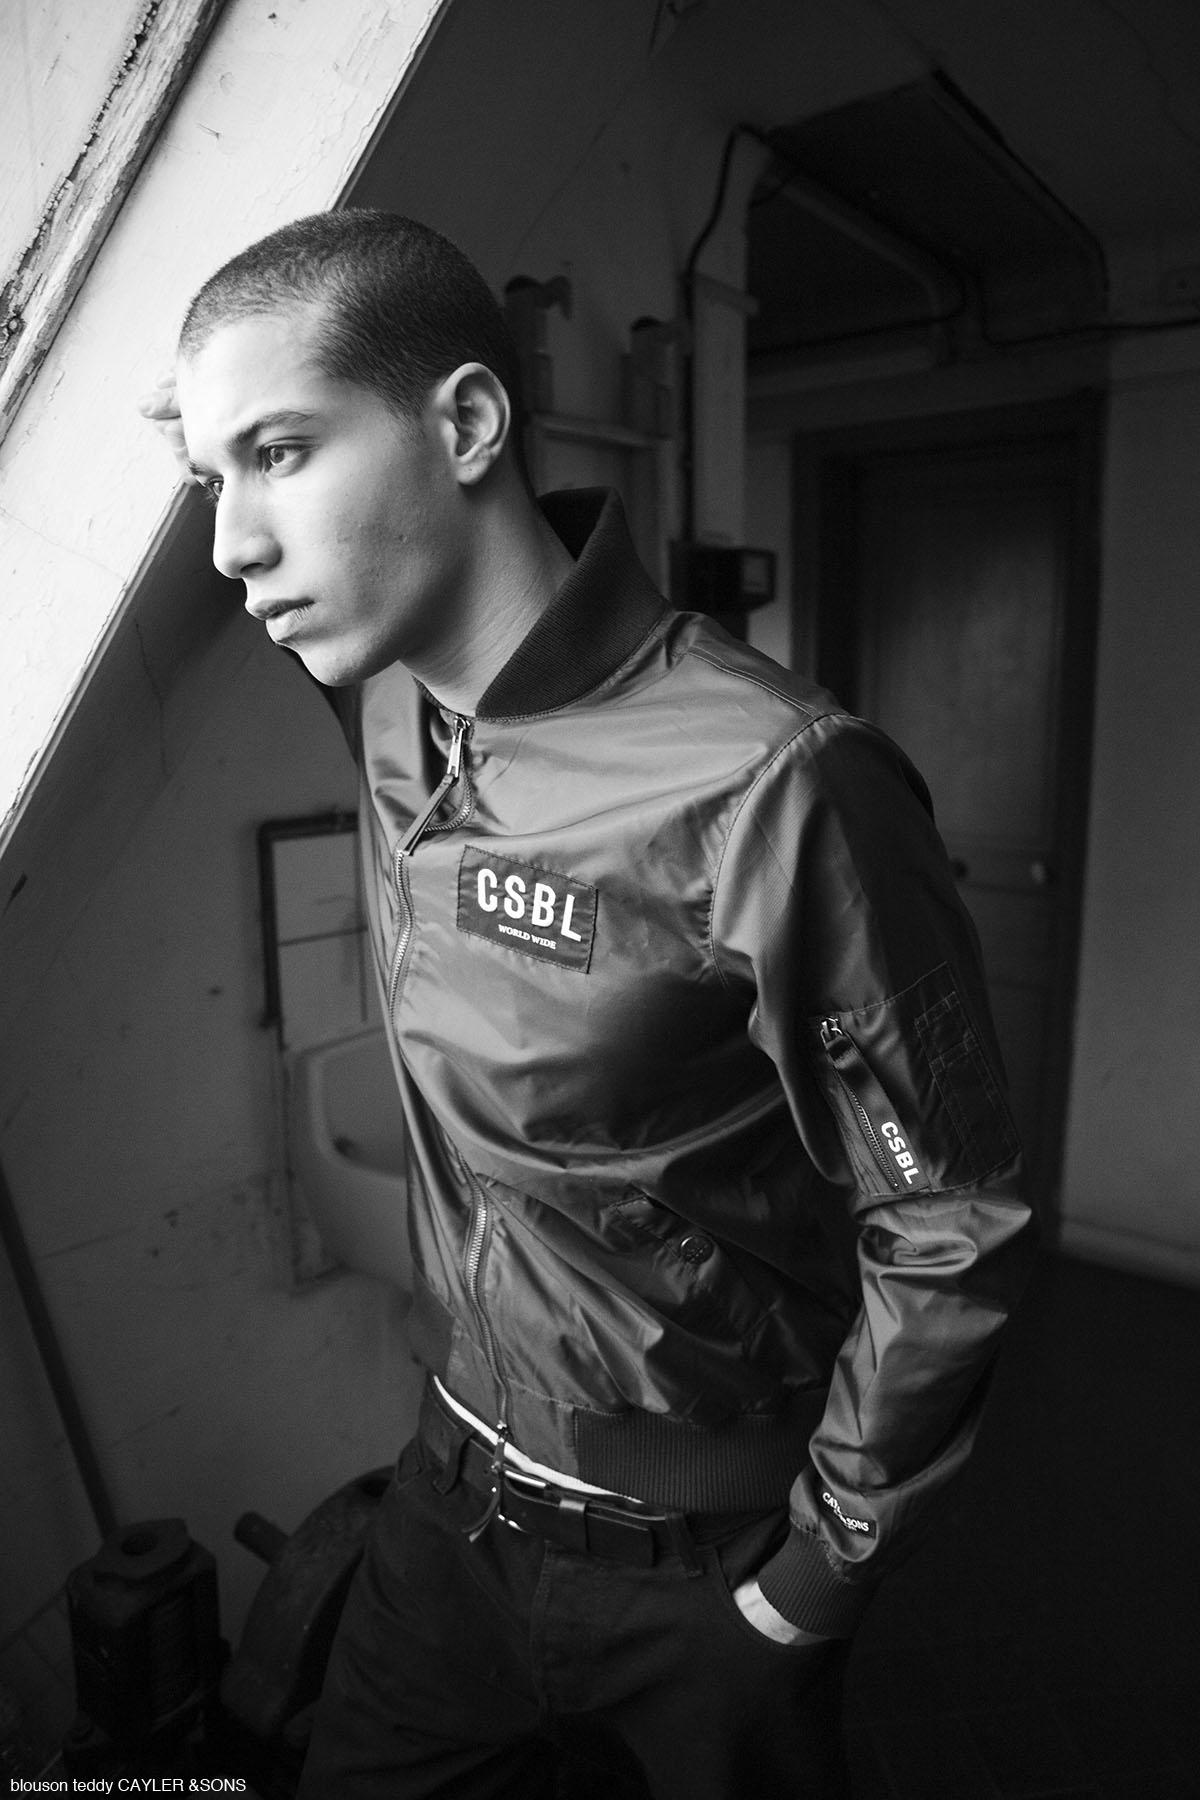 teed-jacket-CAYLER-&-SONS